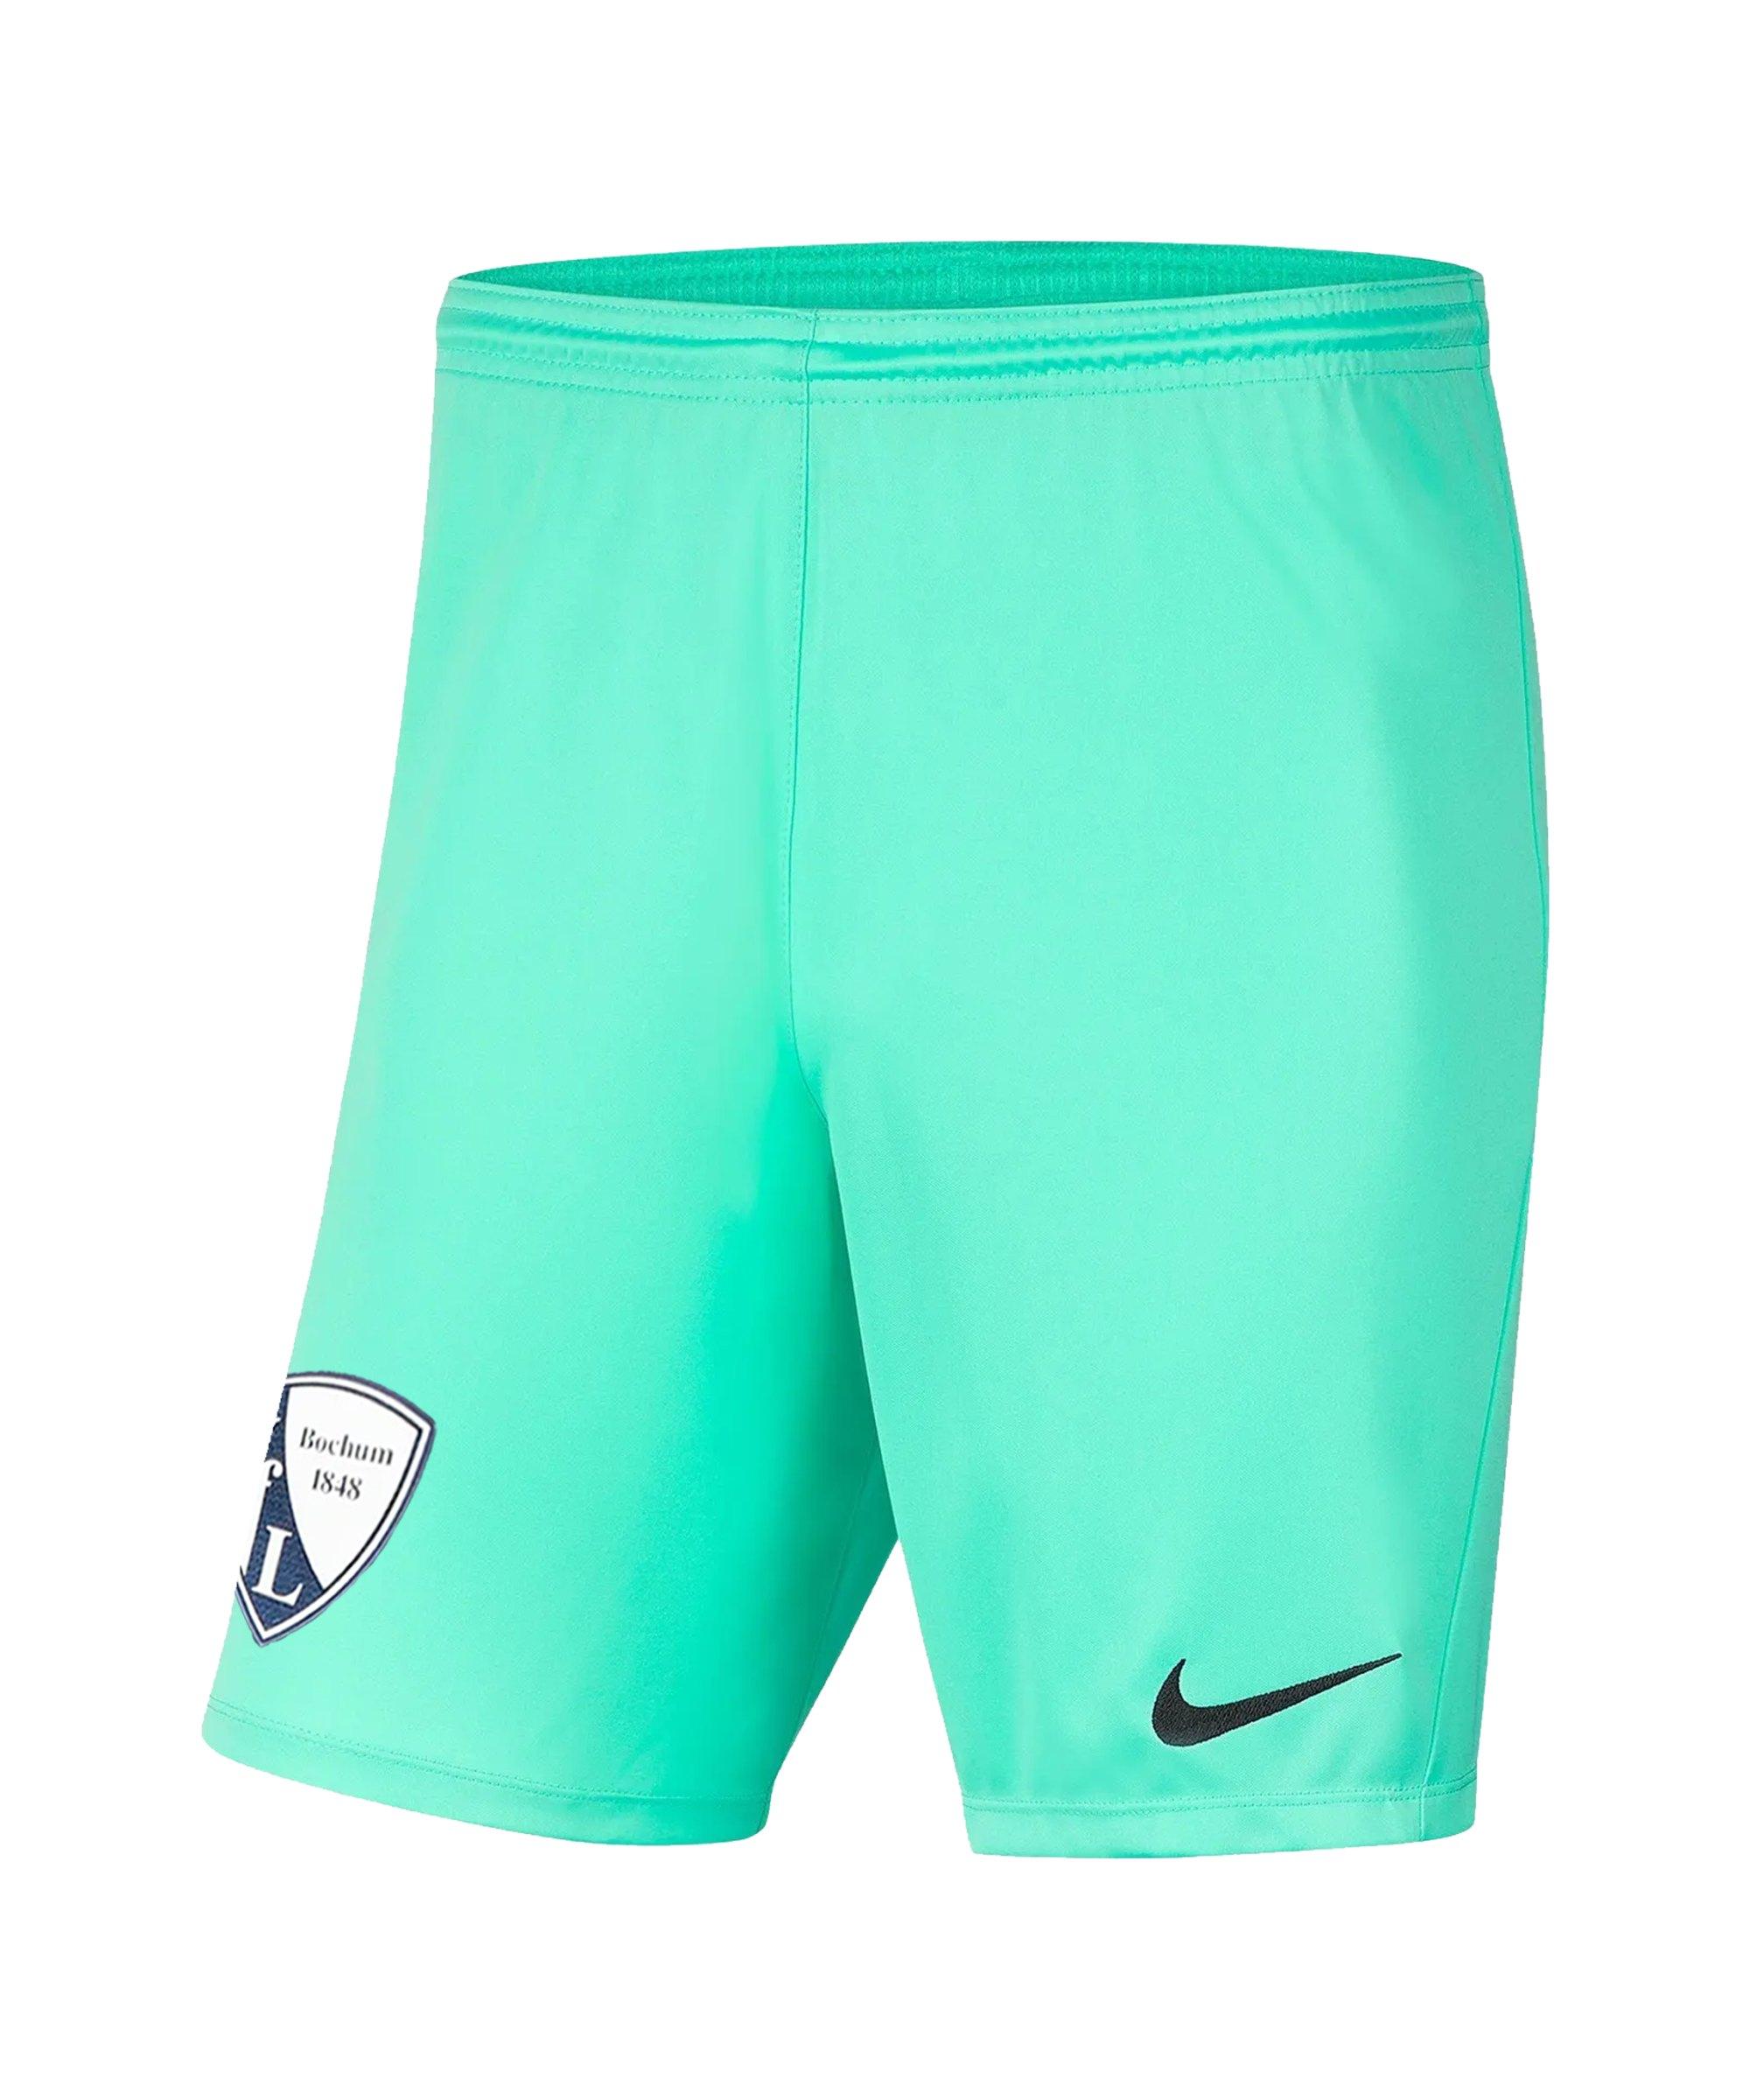 Nike VfL Bochum Short 3rd 2021/2022 Kids Türkis F354 - tuerkis